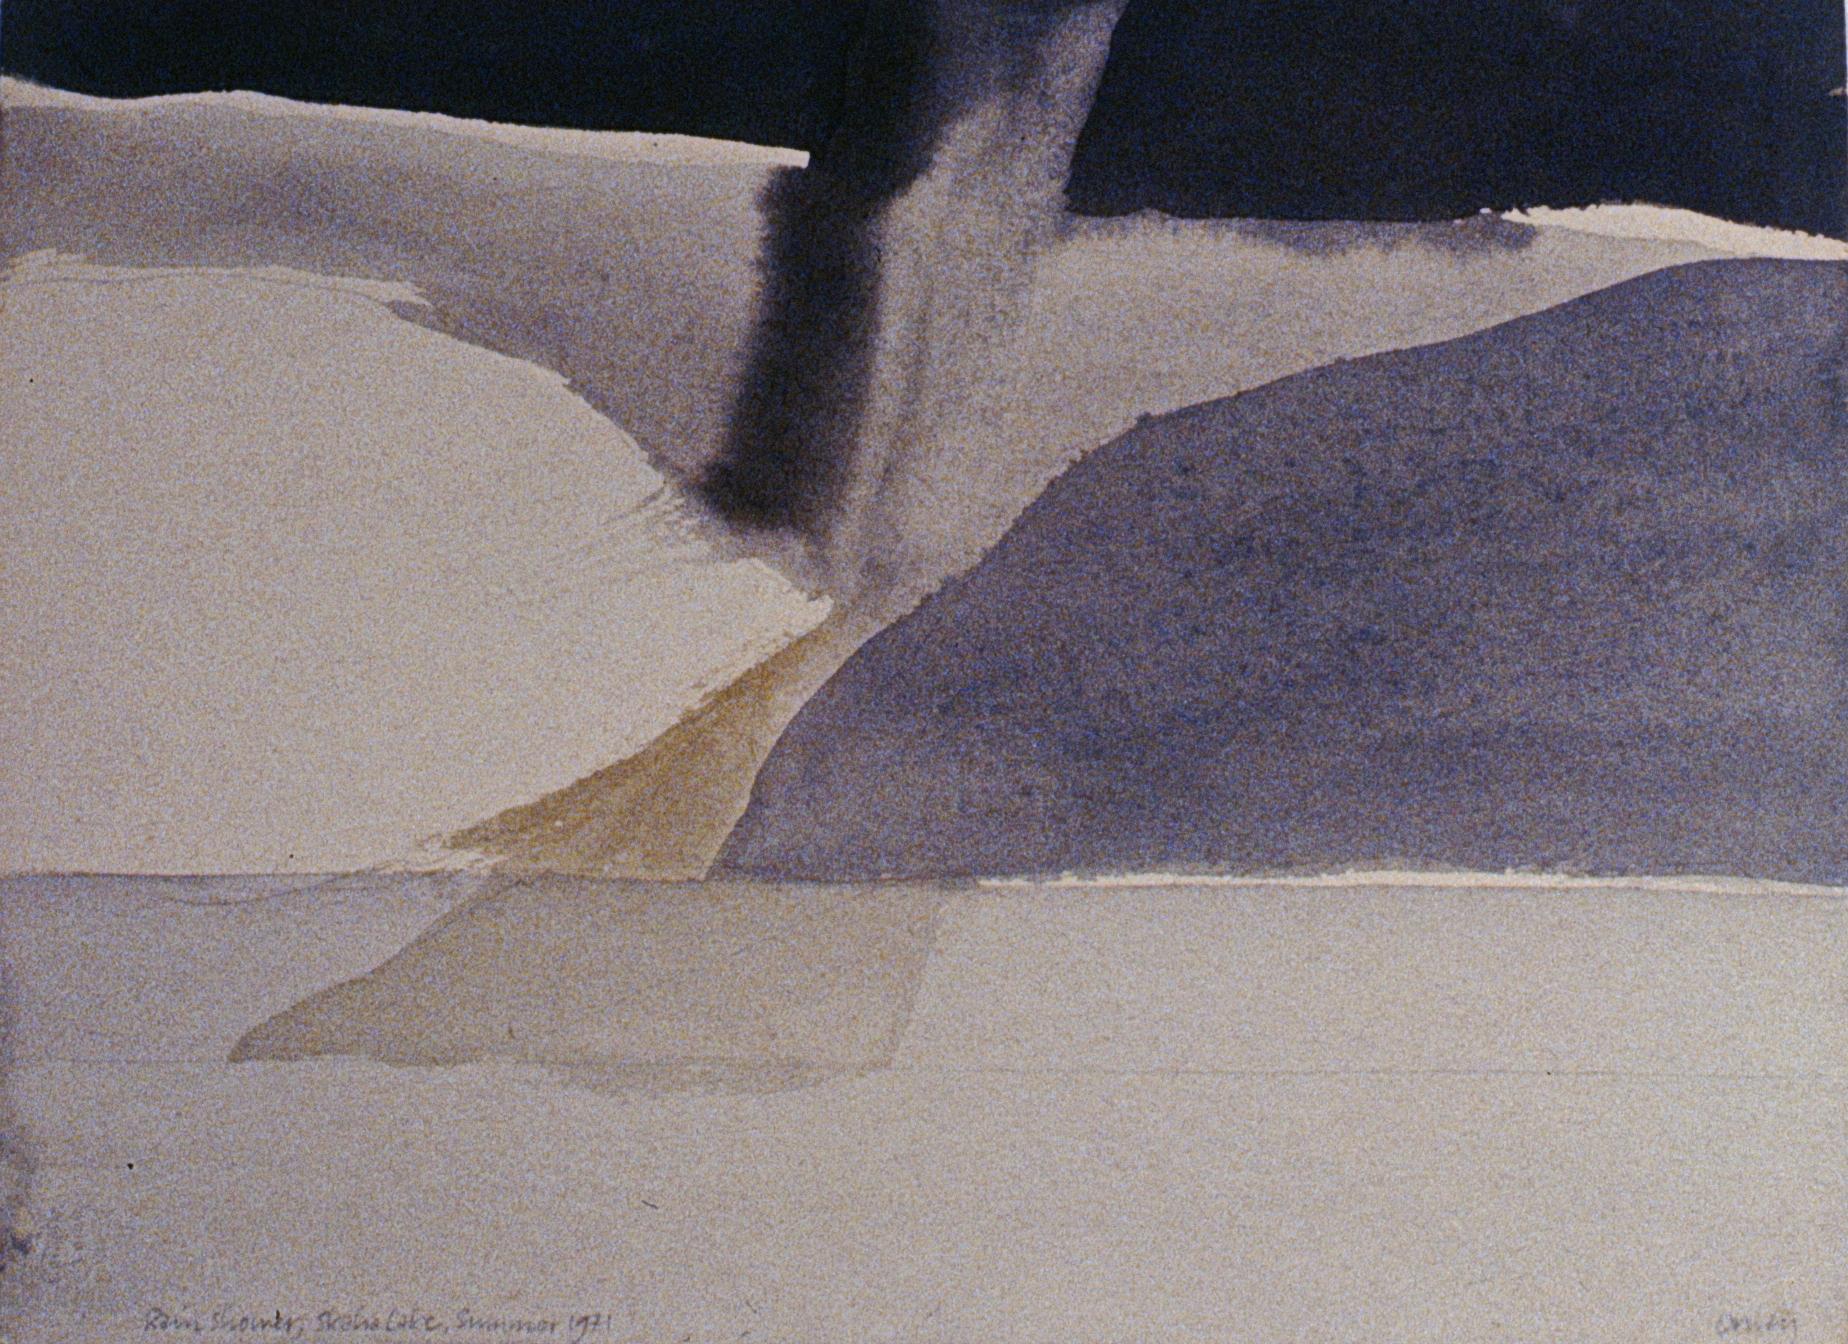 Rains Shower, Skaha Lake , 1971, Toni Onley, watercolour on paper, 38 cm x 28 cm, 1978.02.01, gift of the artist